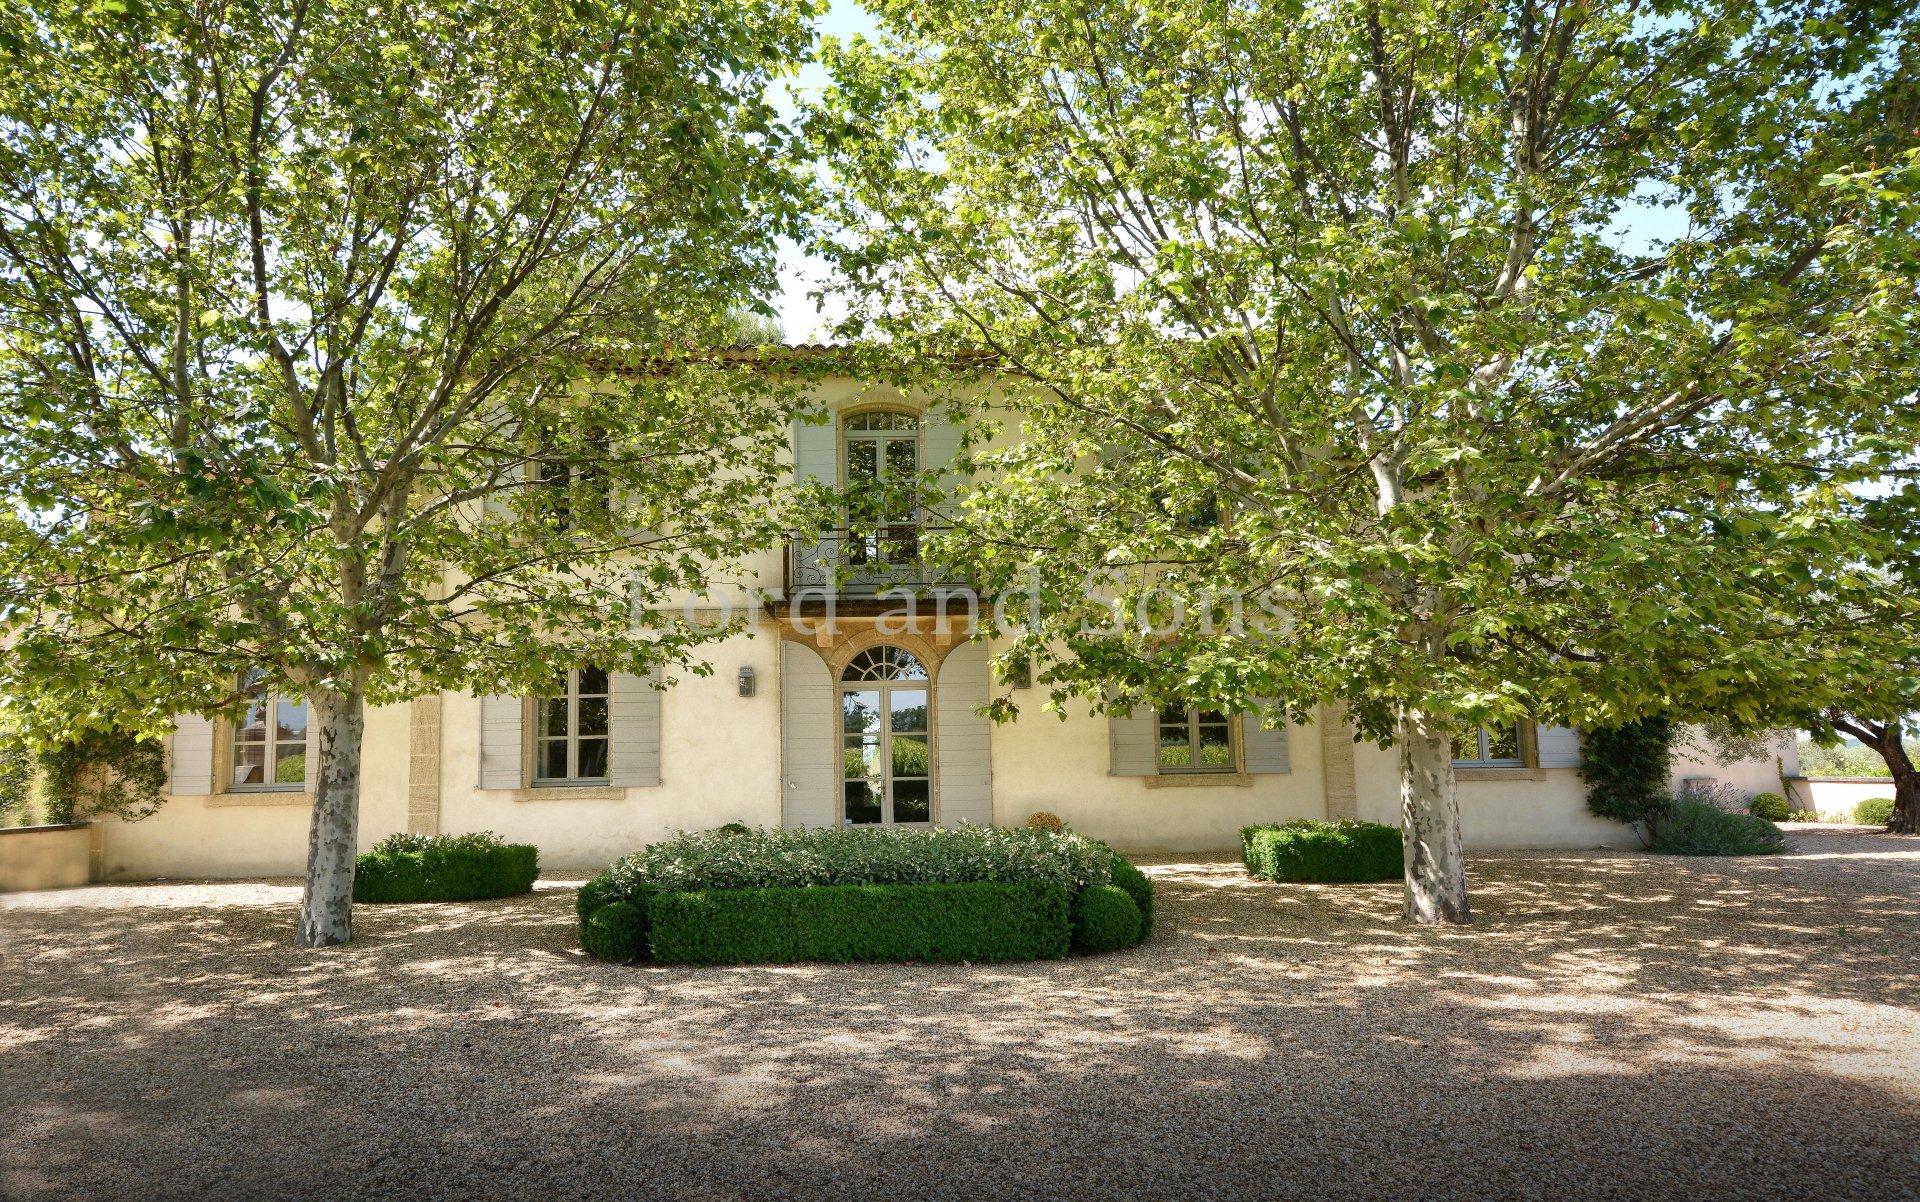 Propriété viticole a vendre a Mazan